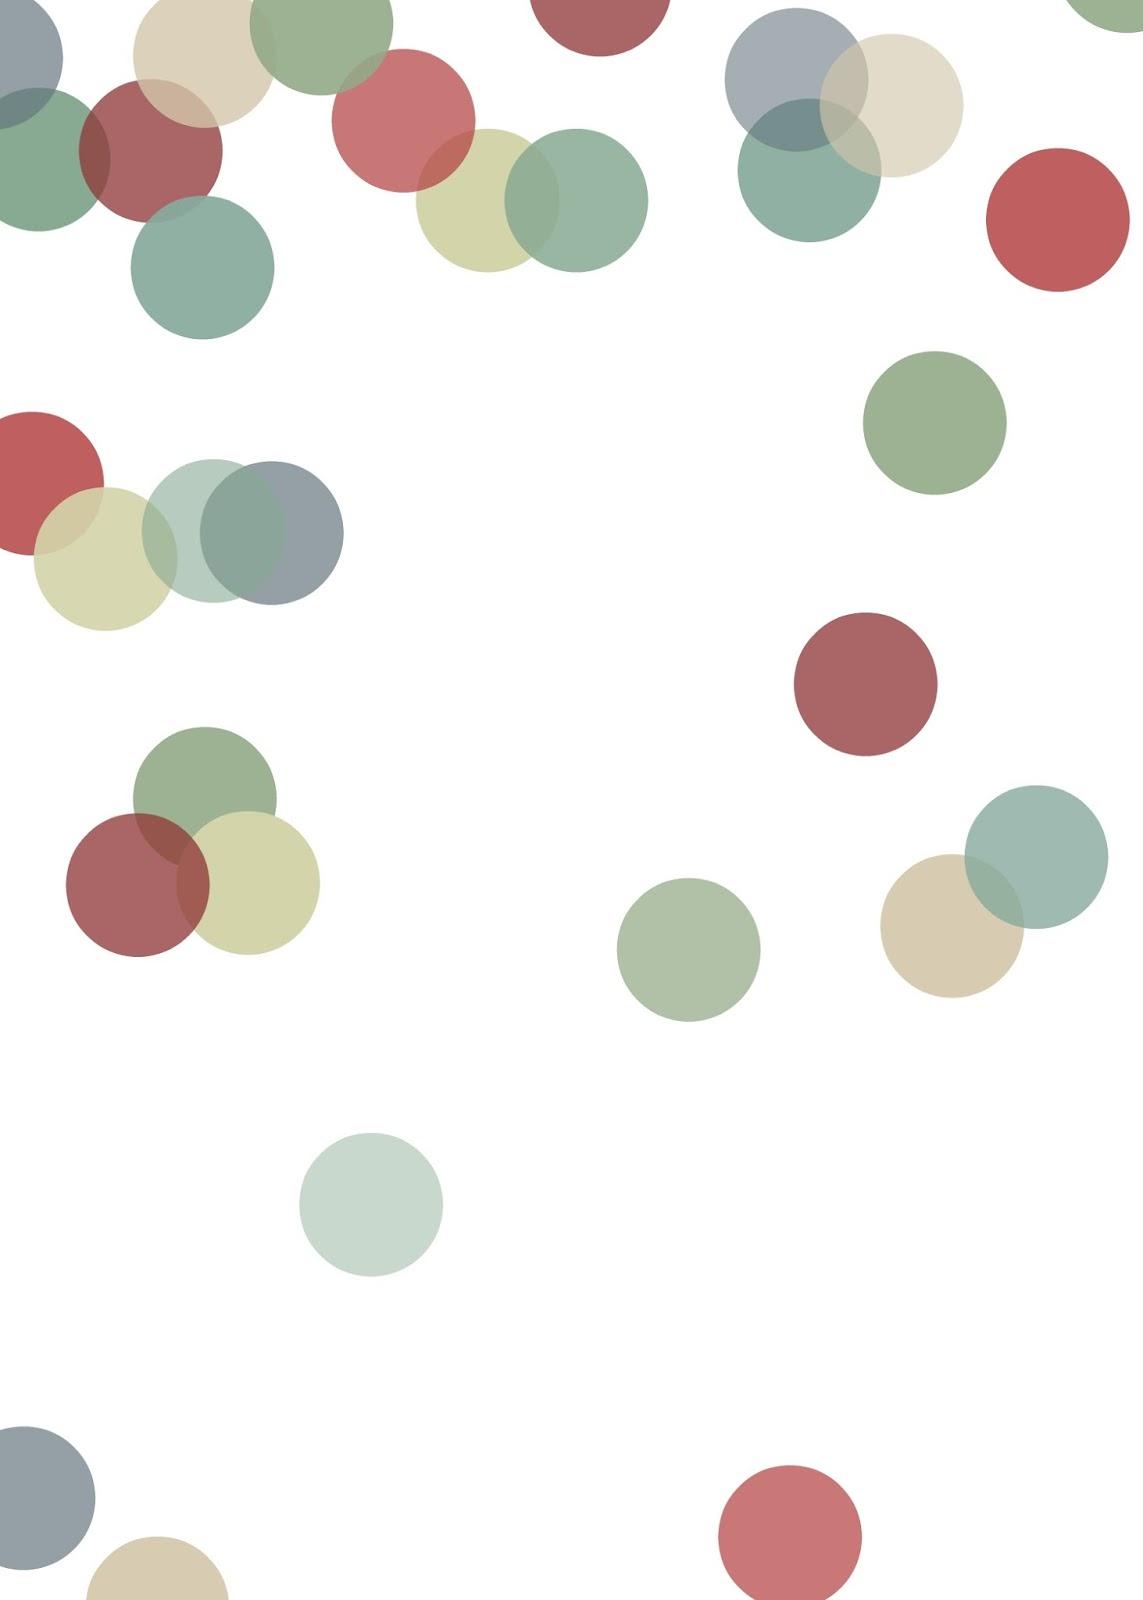 Stripes + Sweets: Polka Dot Background